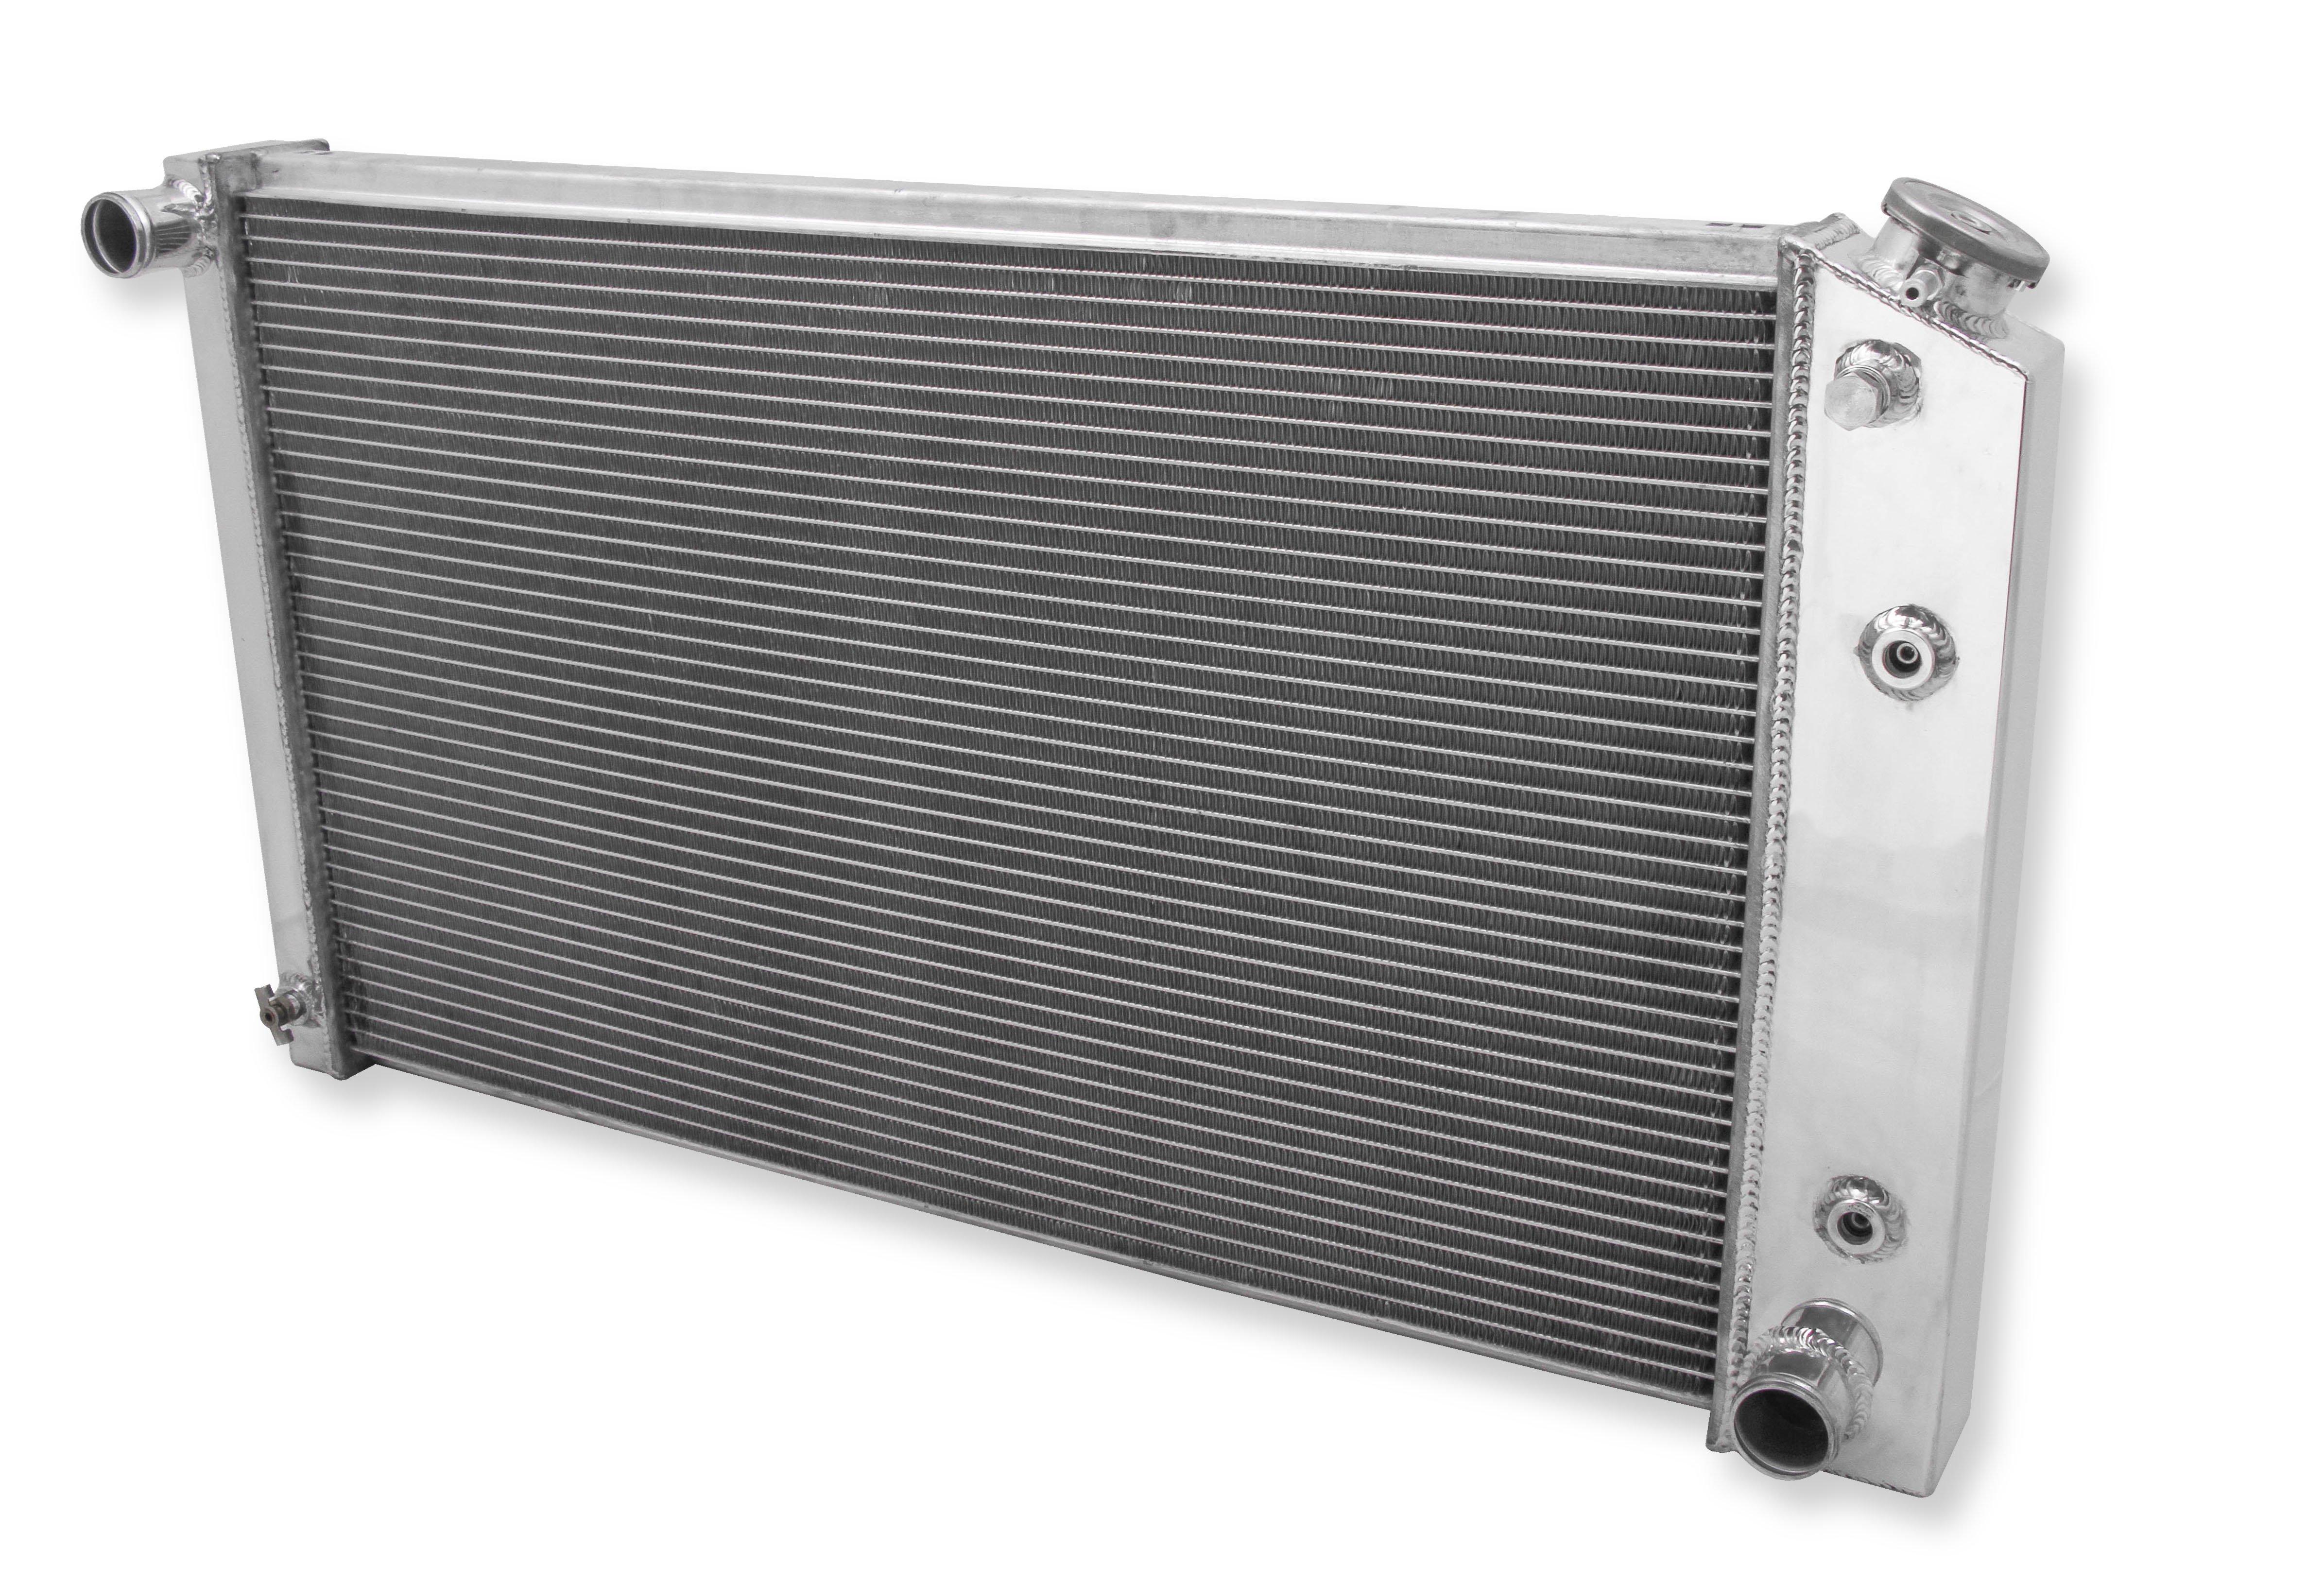 1971-1990 Chevy Caprice 2 Row Champion All Aluminum Radiator Fan Combo